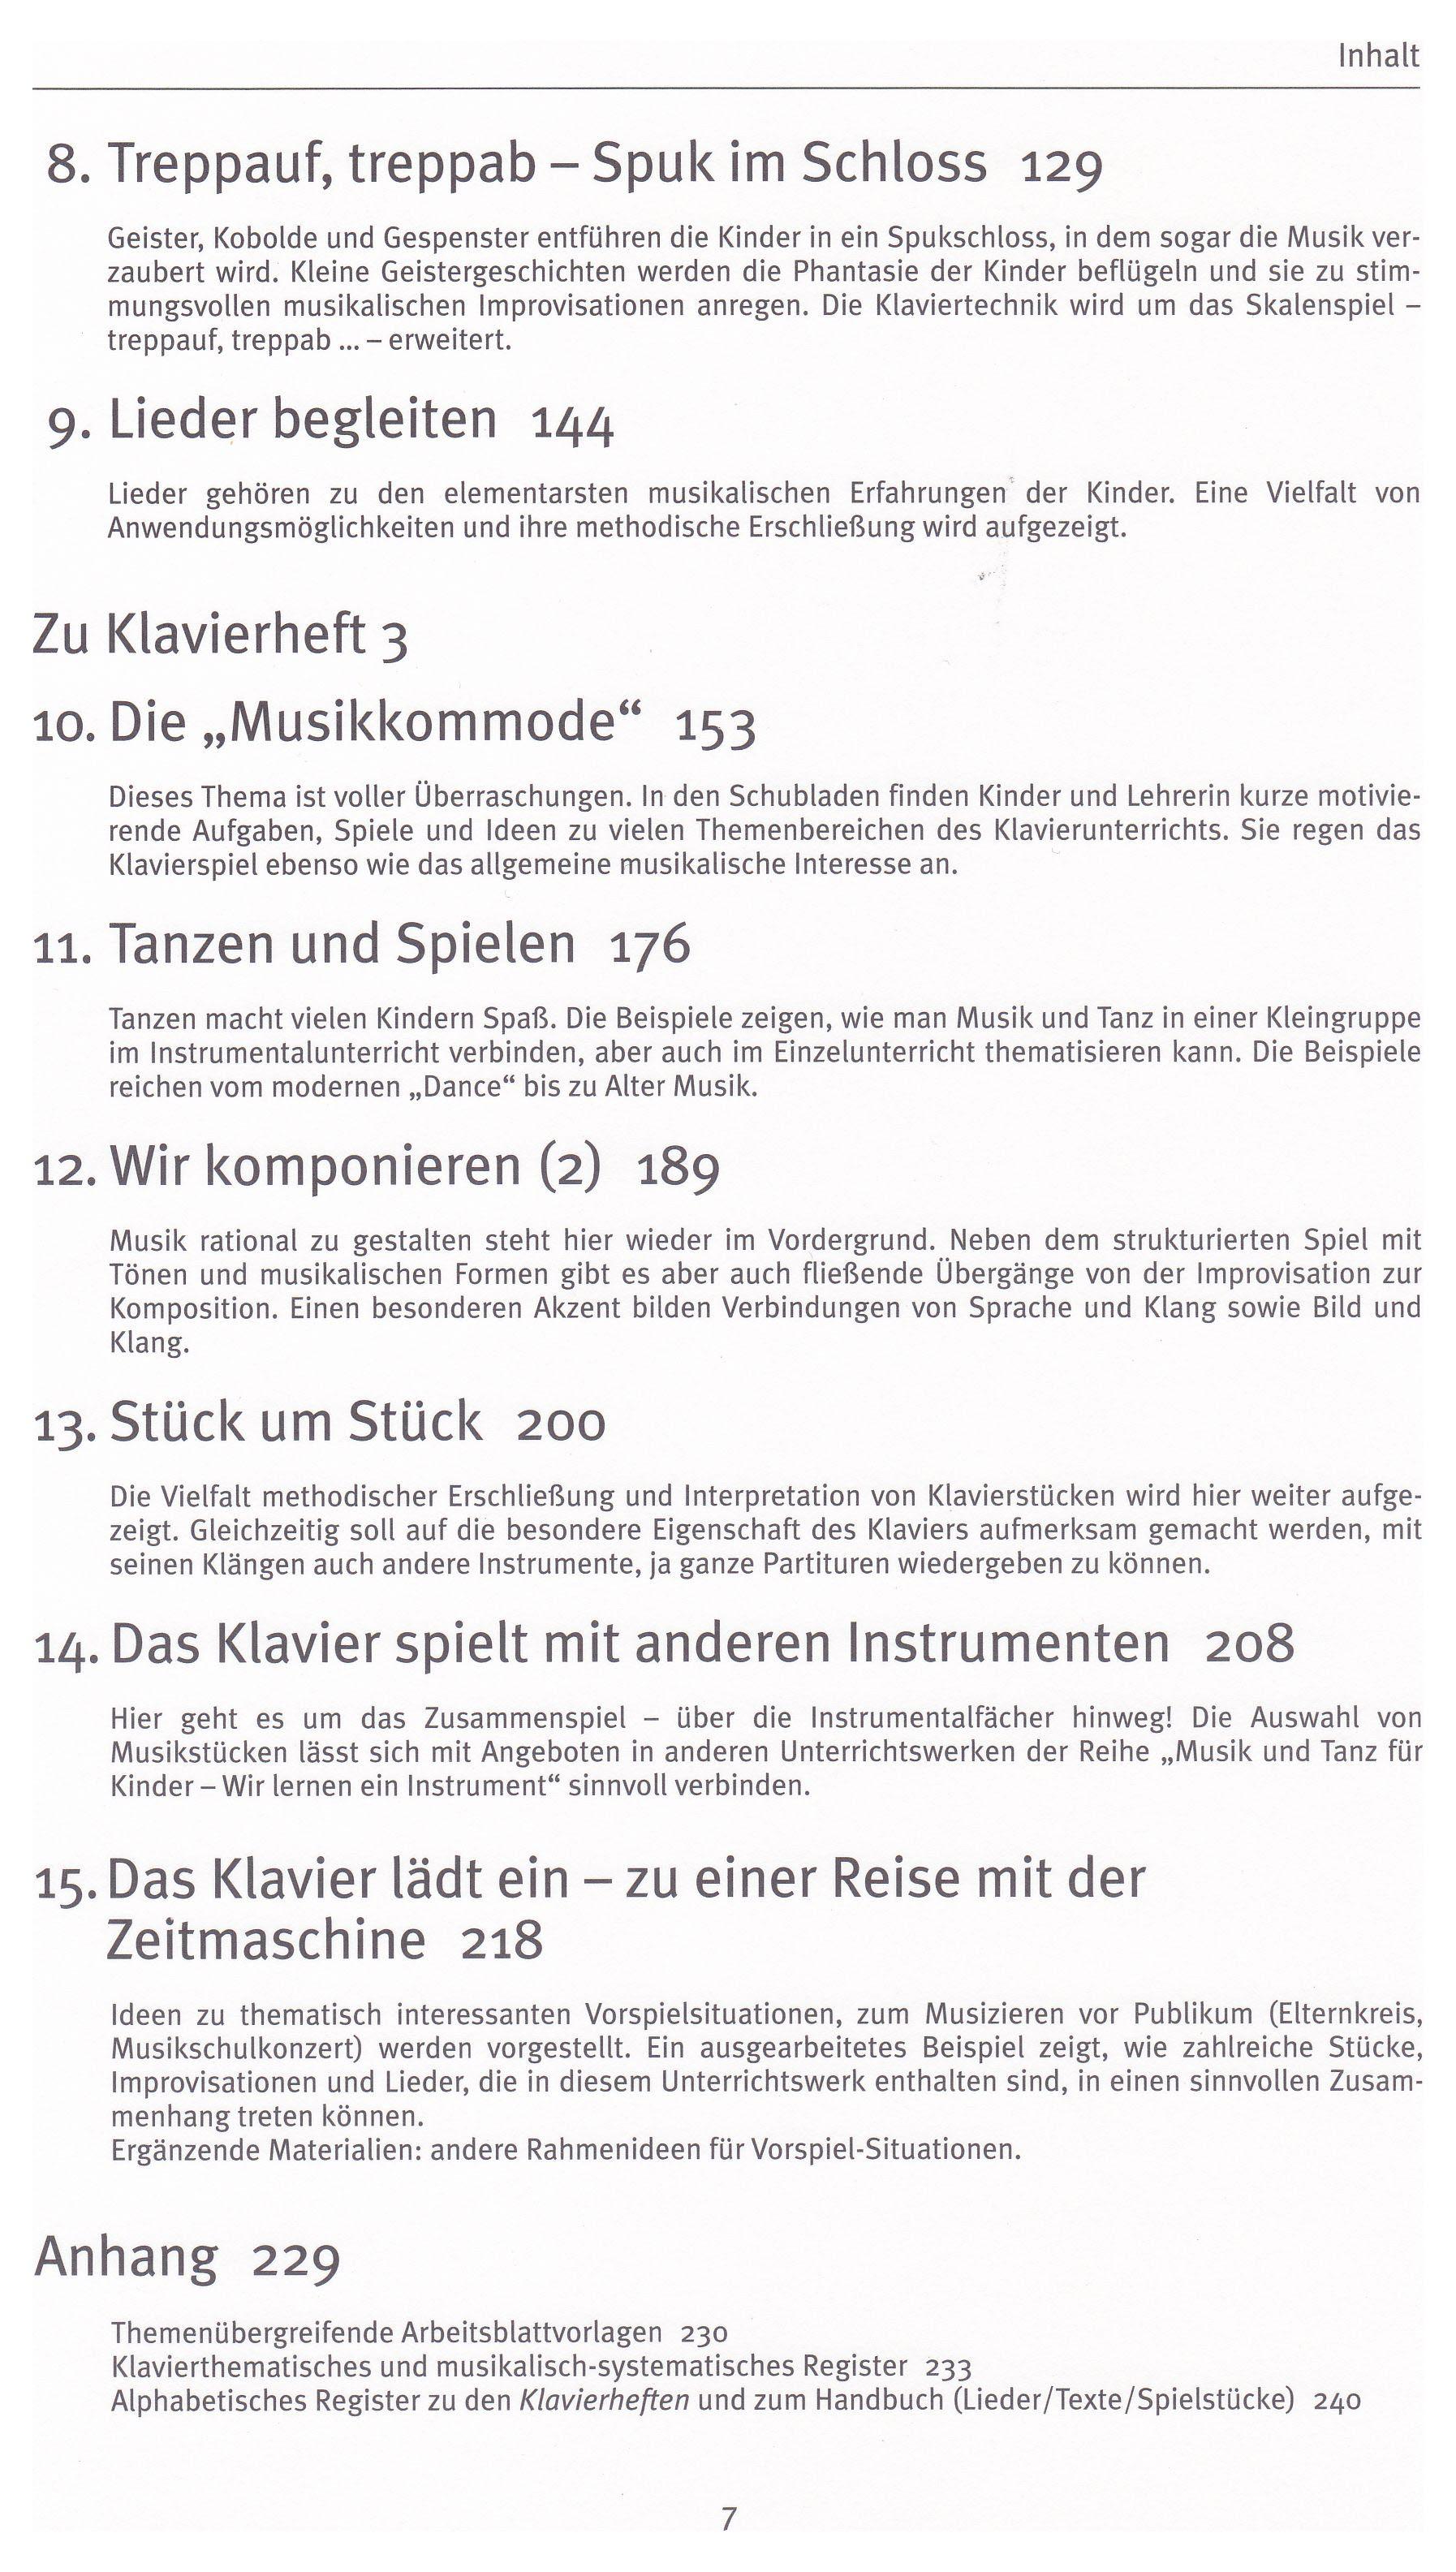 Handbuch Klavier 2